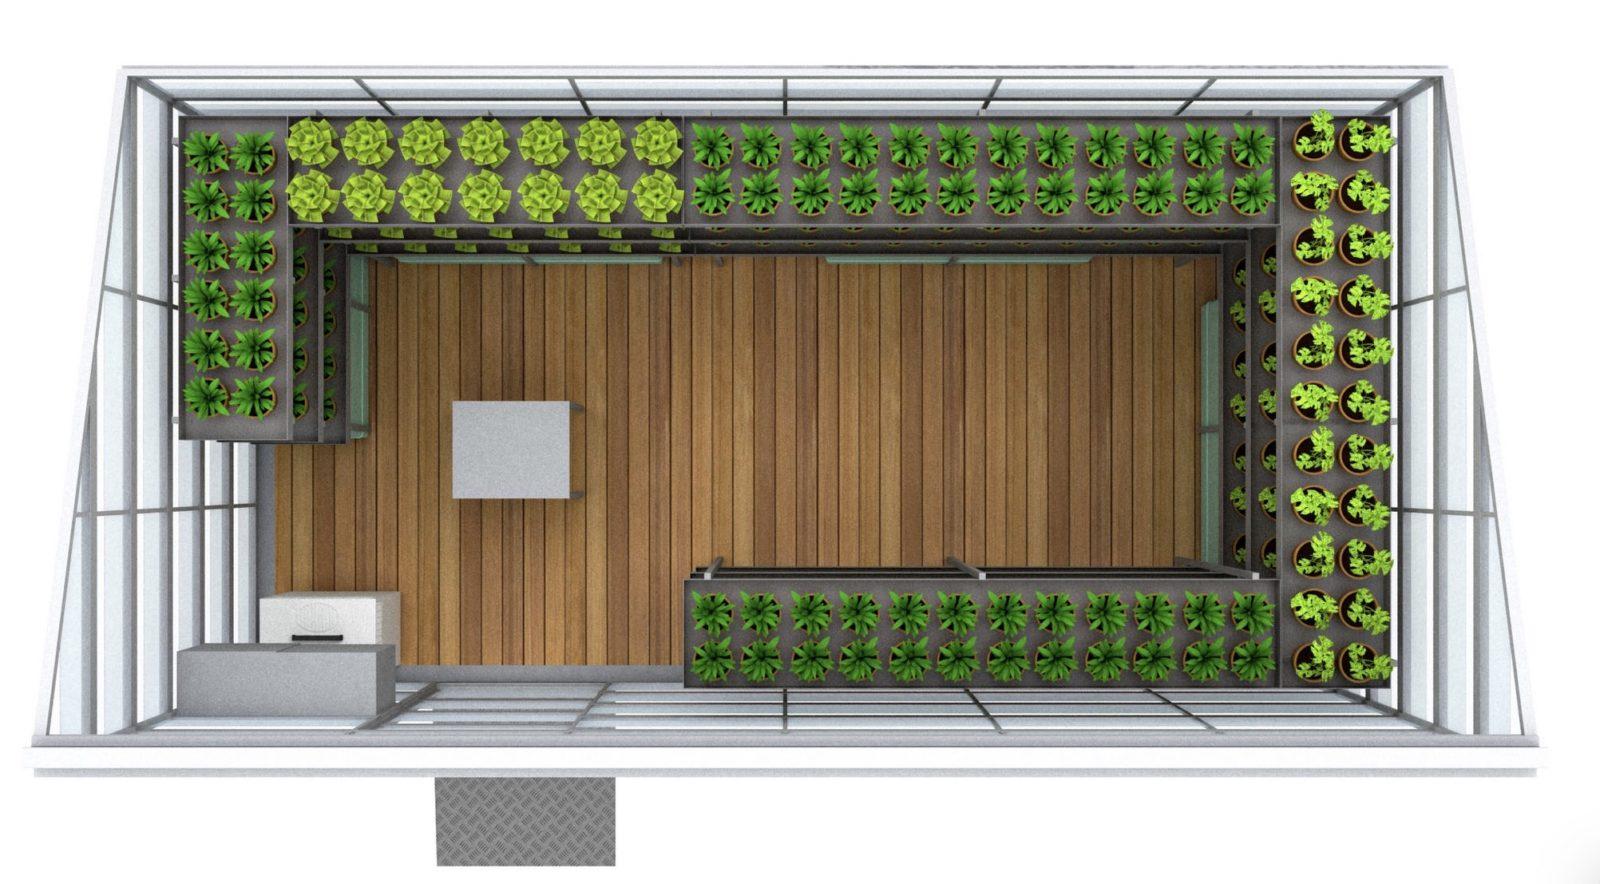 Serranova at CES 2020: modular greenhouses with photoluminescence for 0 KM vegetables